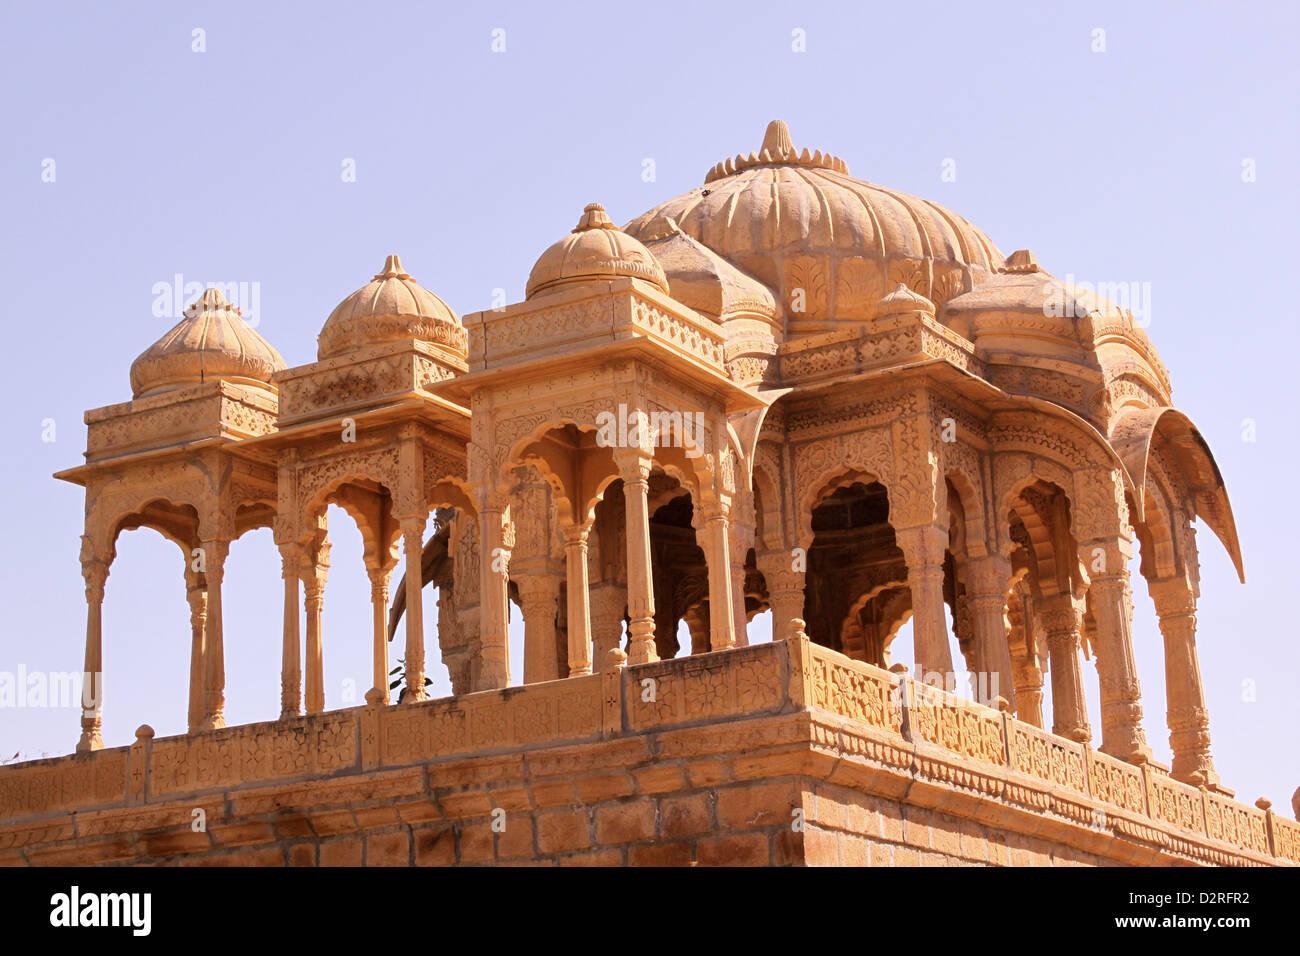 Royal Chhatris or cenotaph's of Bada Bagh Jaisalmer Rajasthan India - Stock Image